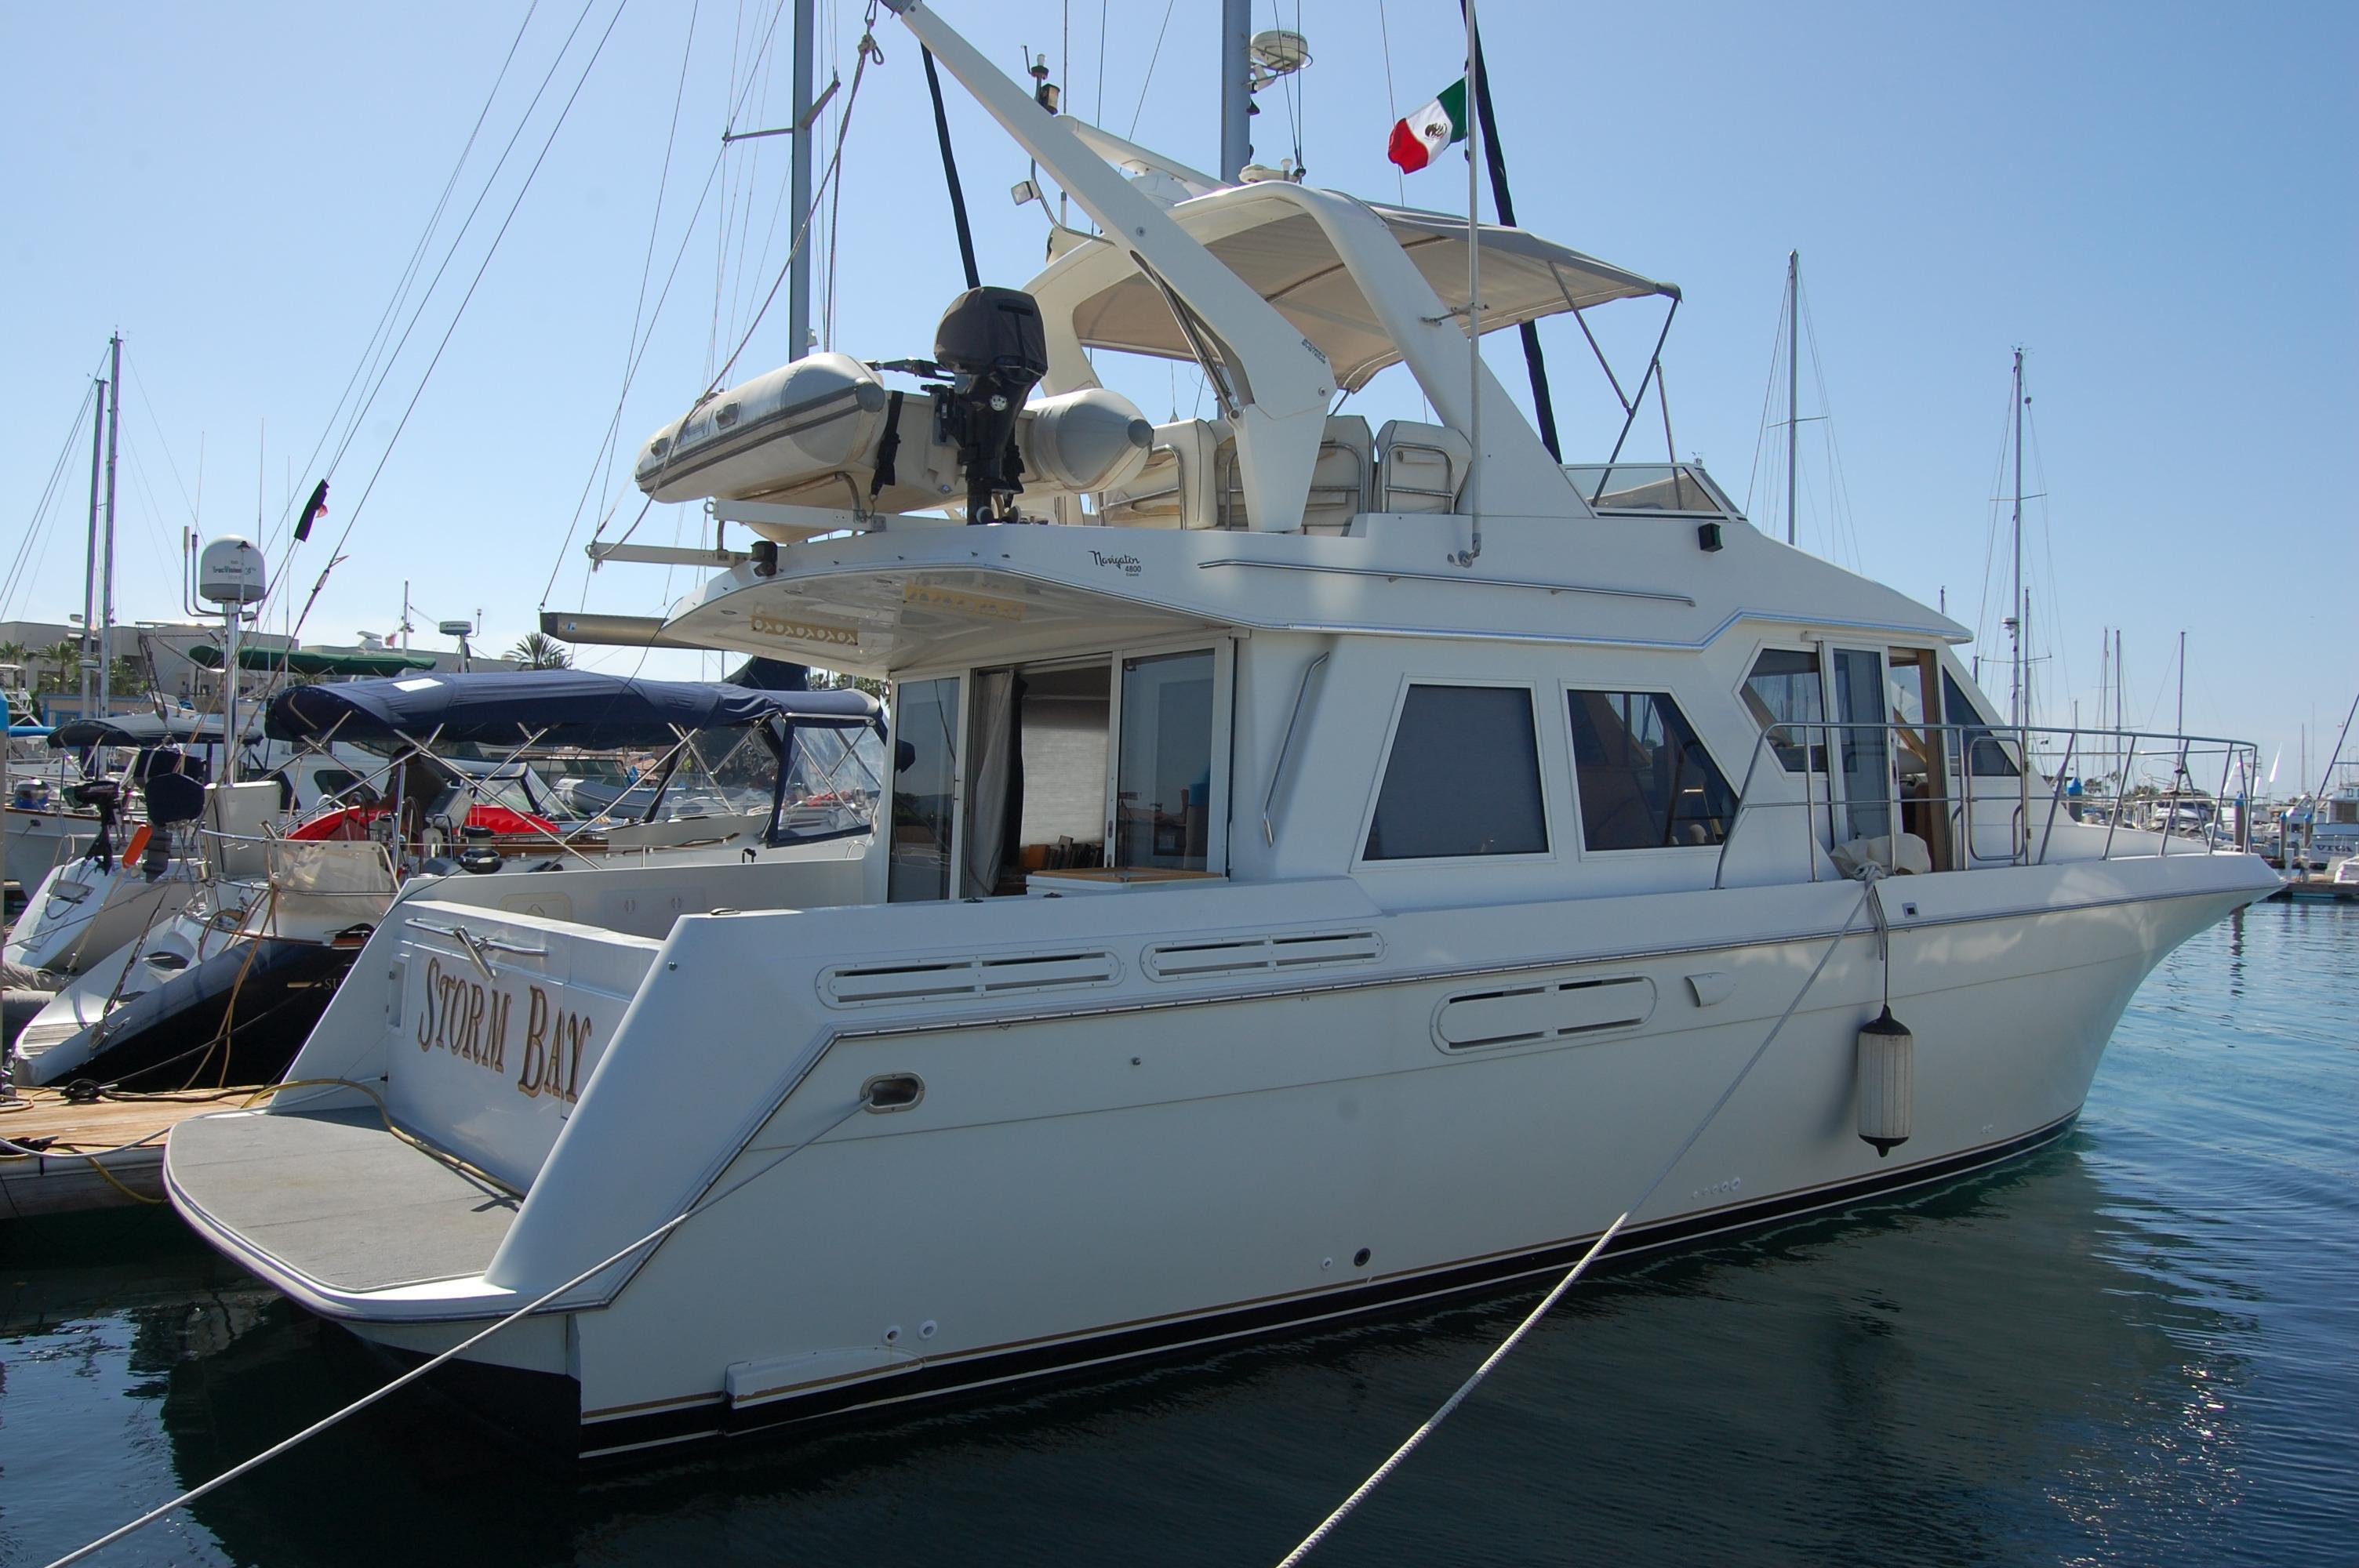 48' Navigator Classic 4800 Cruiser+Boat for sale!